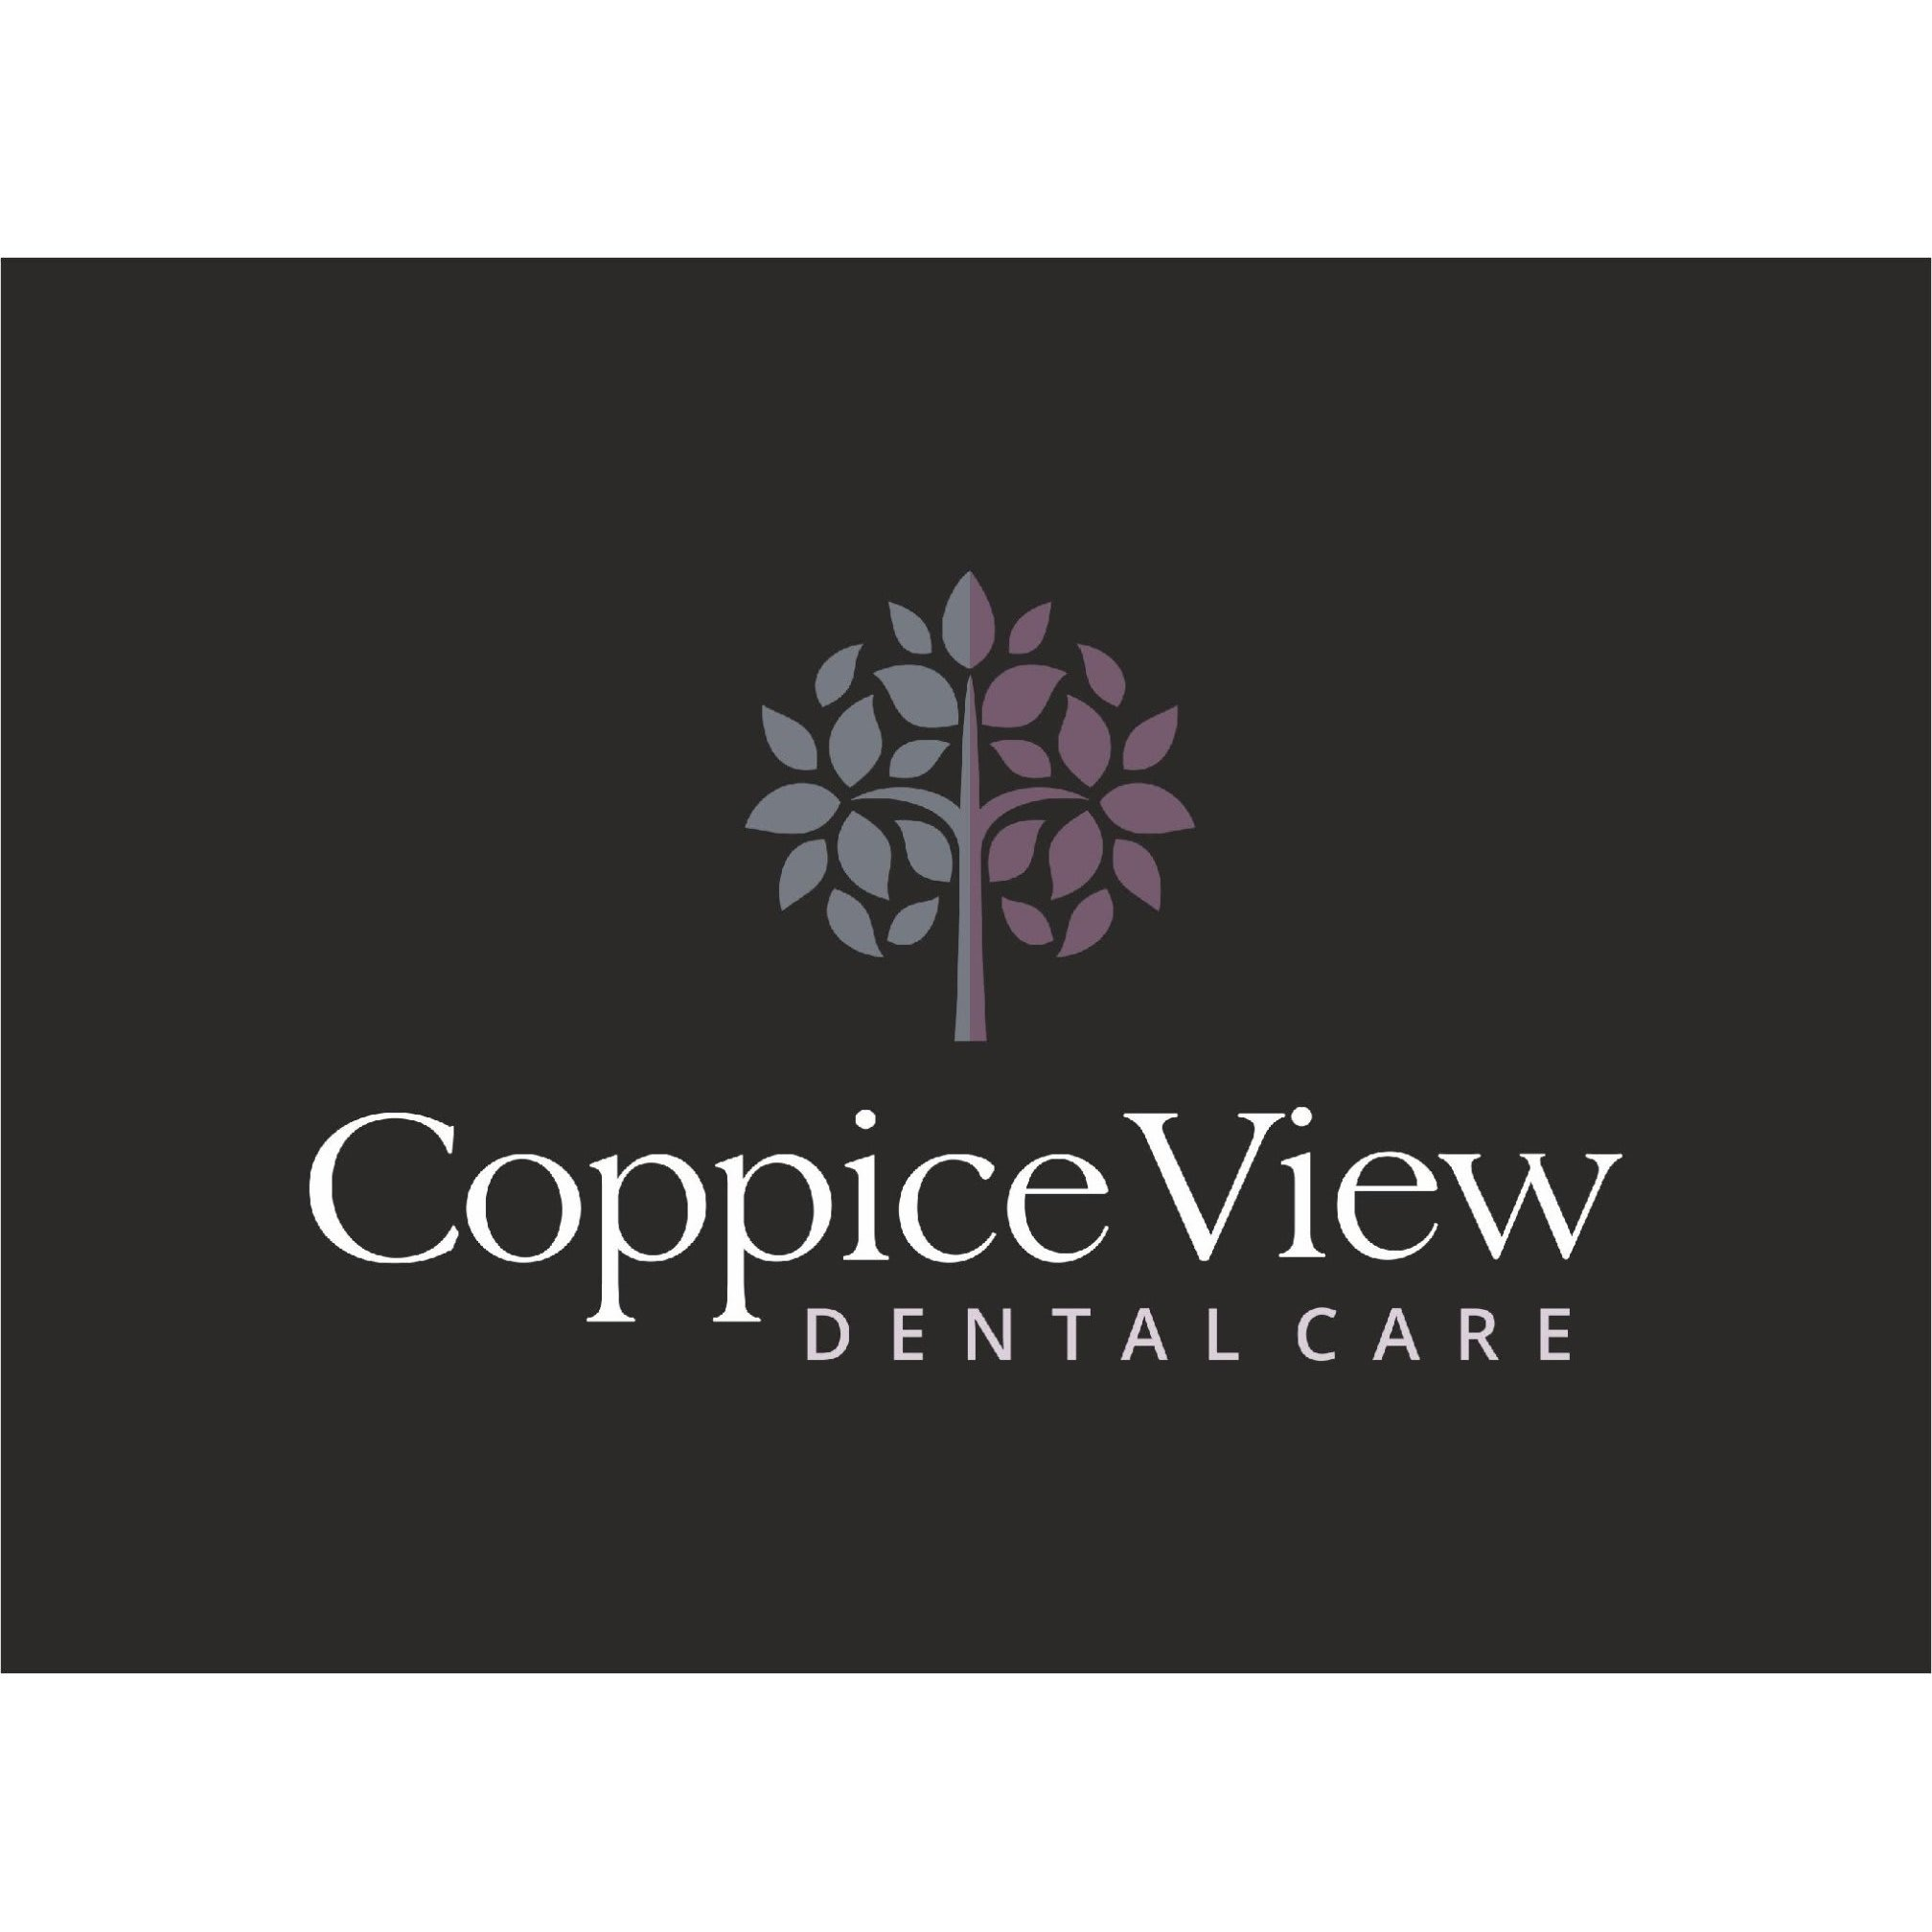 Coppice View Dental Care - Harrogate, North Yorkshire HG1 5HH - 01423 503428 | ShowMeLocal.com